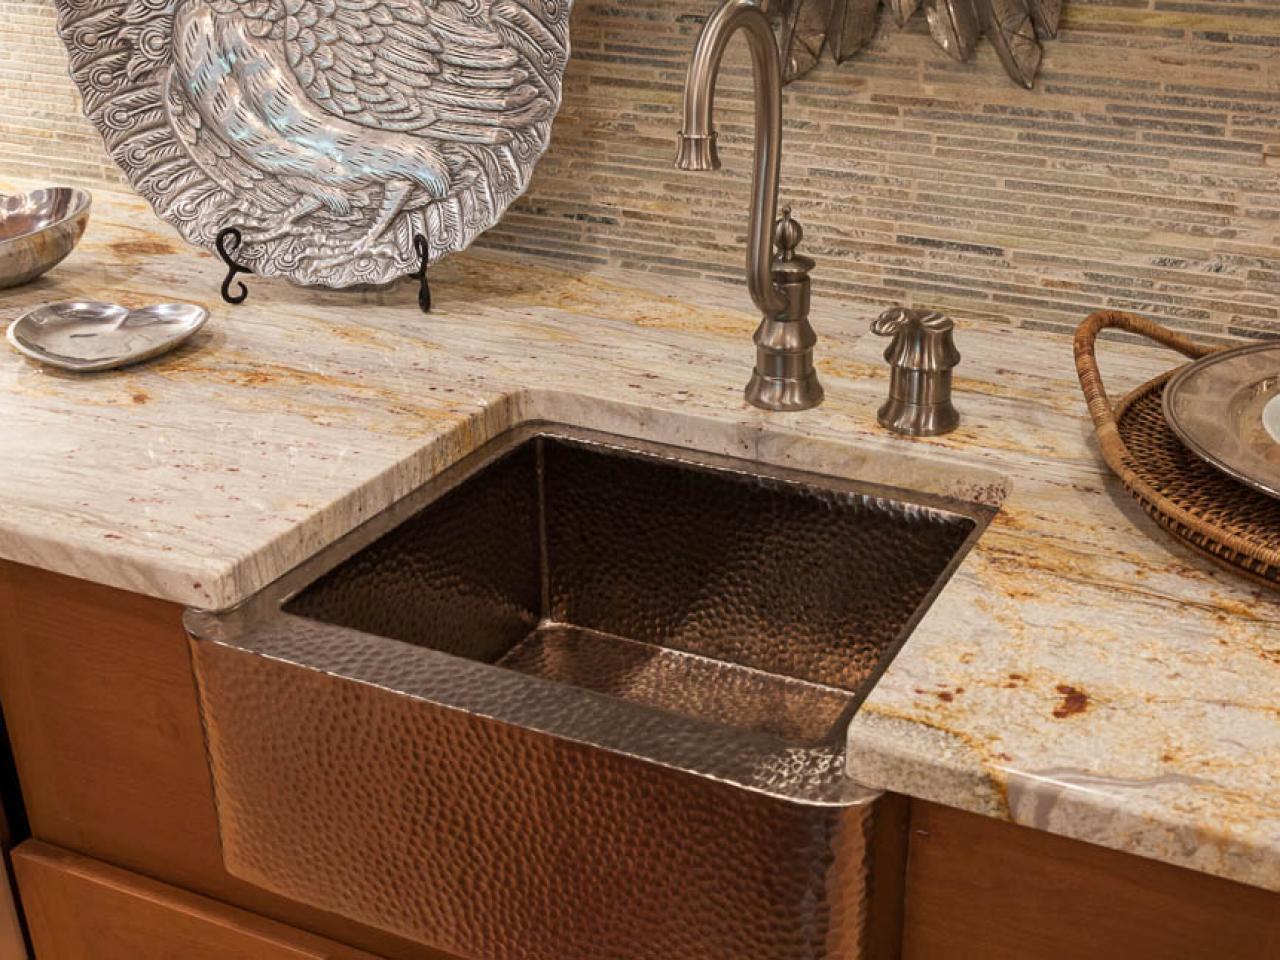 Farmhouse Bar Sink : copper farmhouse sink and tile backsplash this copper farmhouse sink ...